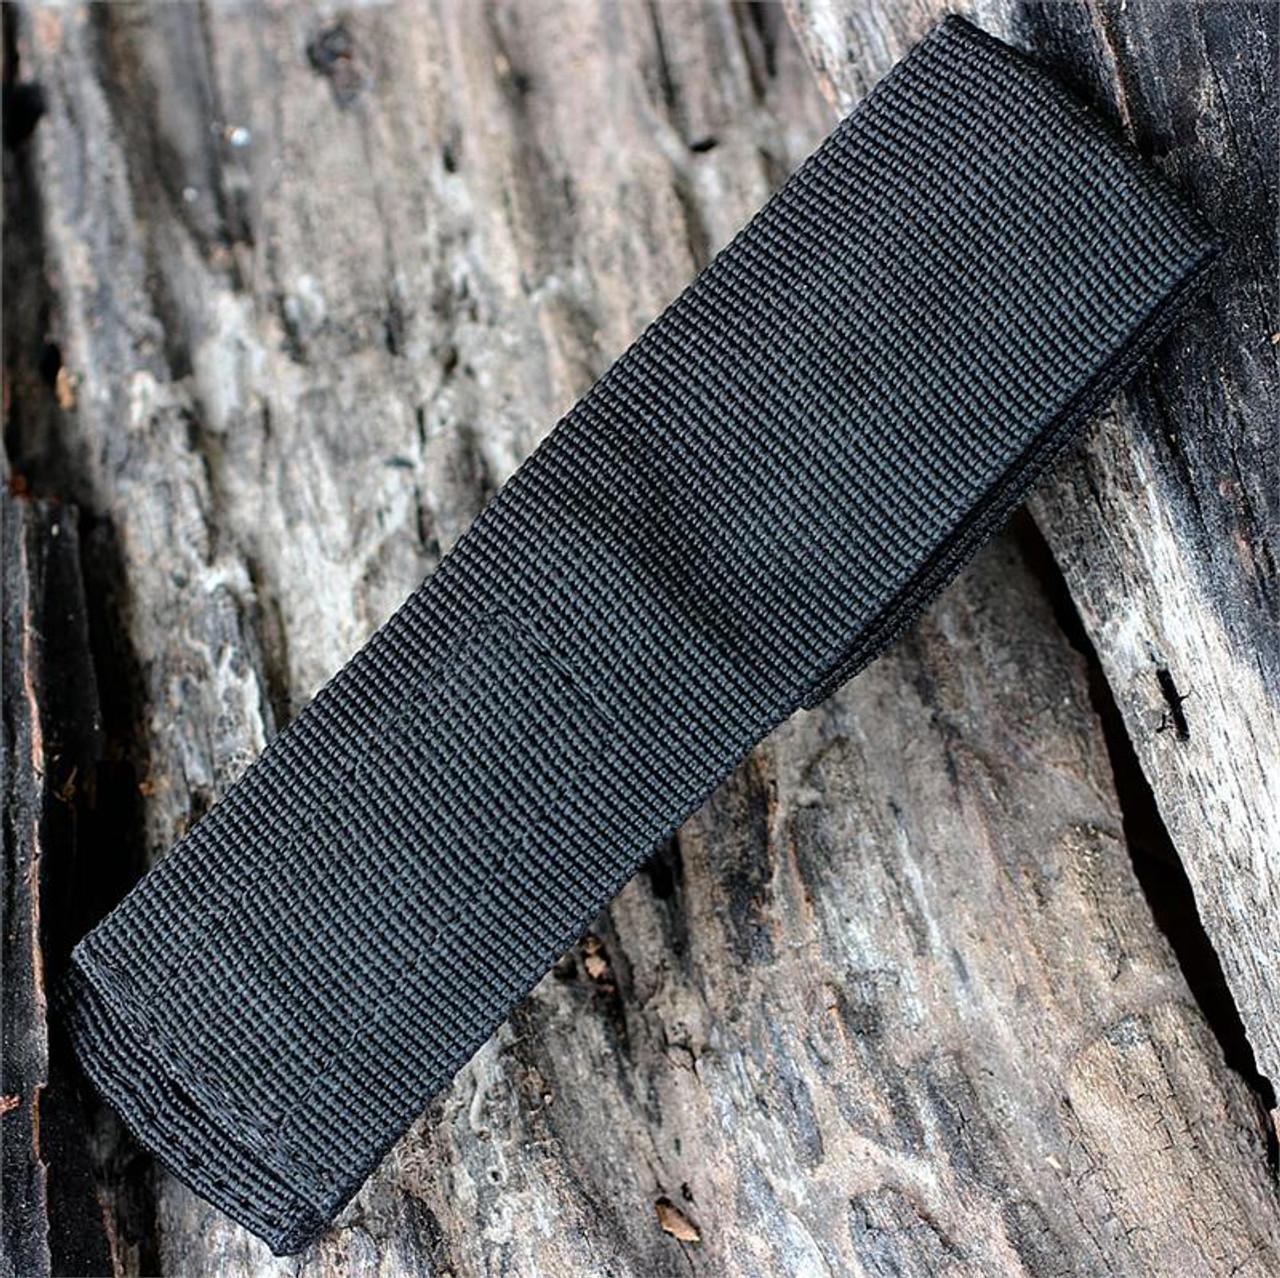 ESEE Candiru Sheath, Cordura w/ Plastic Liner, Black